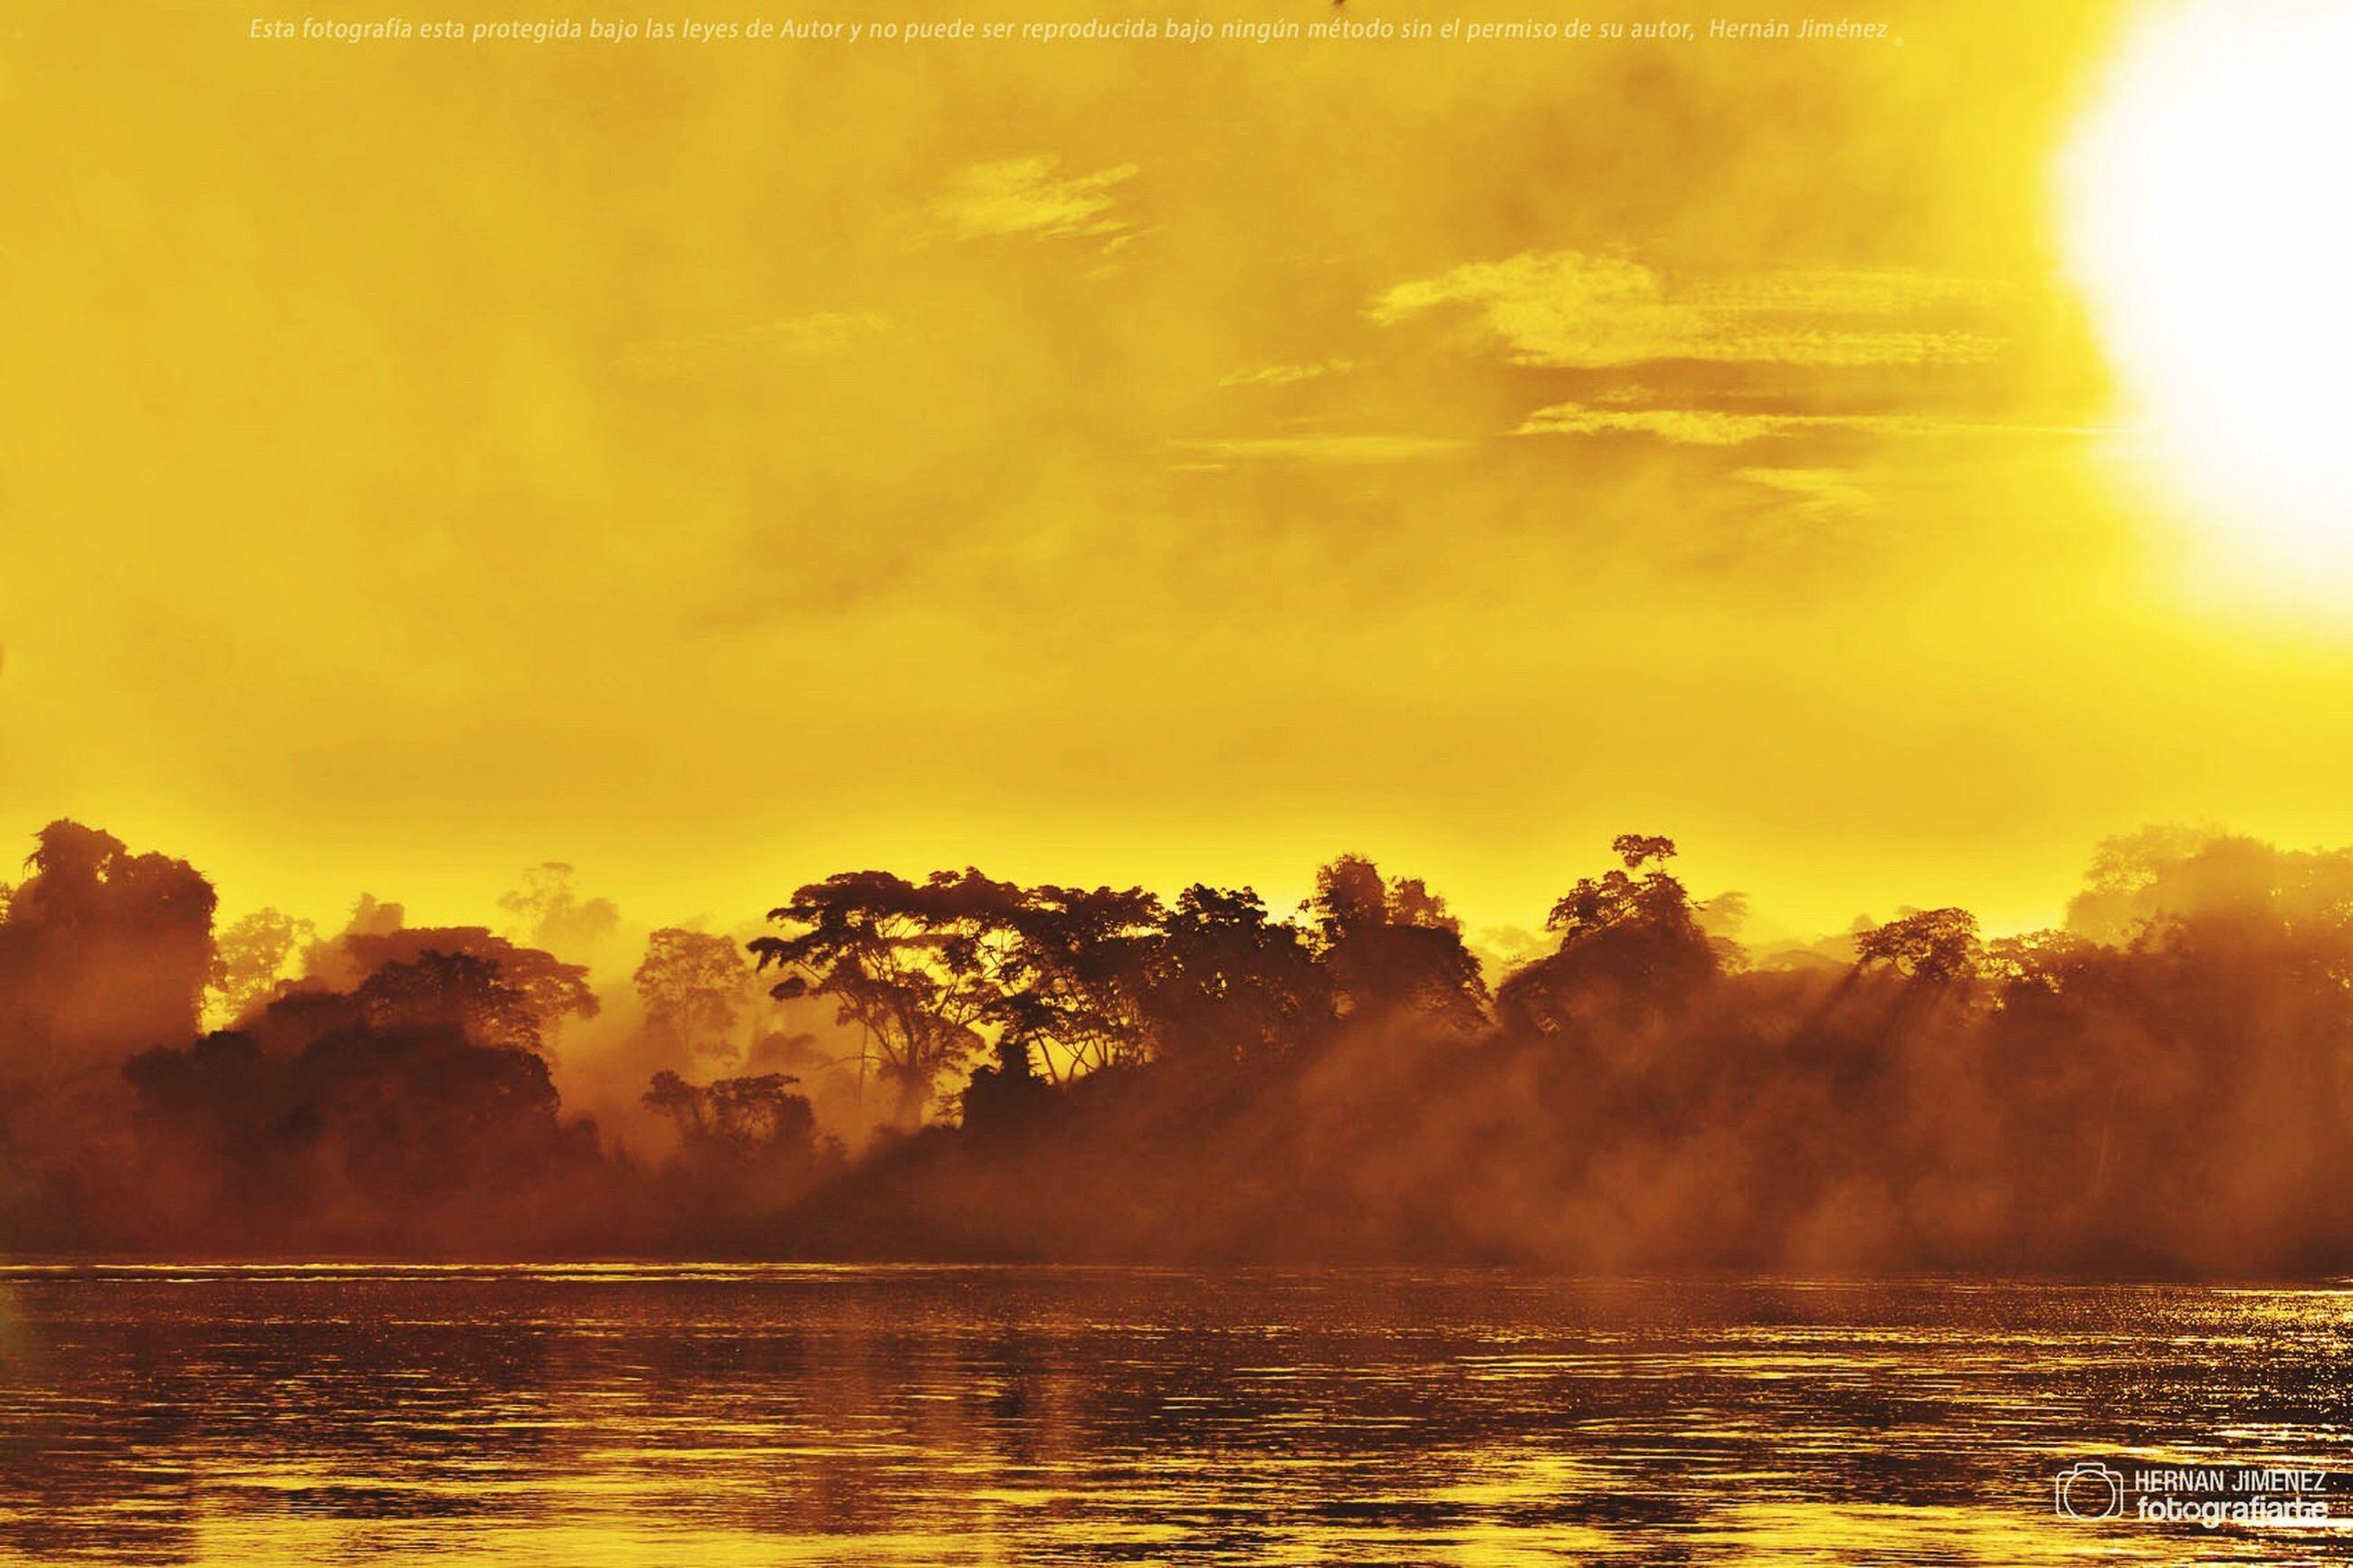 sunset, water, sun, scenics, beauty in nature, tranquil scene, tranquility, sunbeam, sky, nature, sunlight, tree, idyllic, orange color, lens flare, cloud - sky, outdoors, no people, back lit, non-urban scene, growth, cloud, remote, majestic, landscape